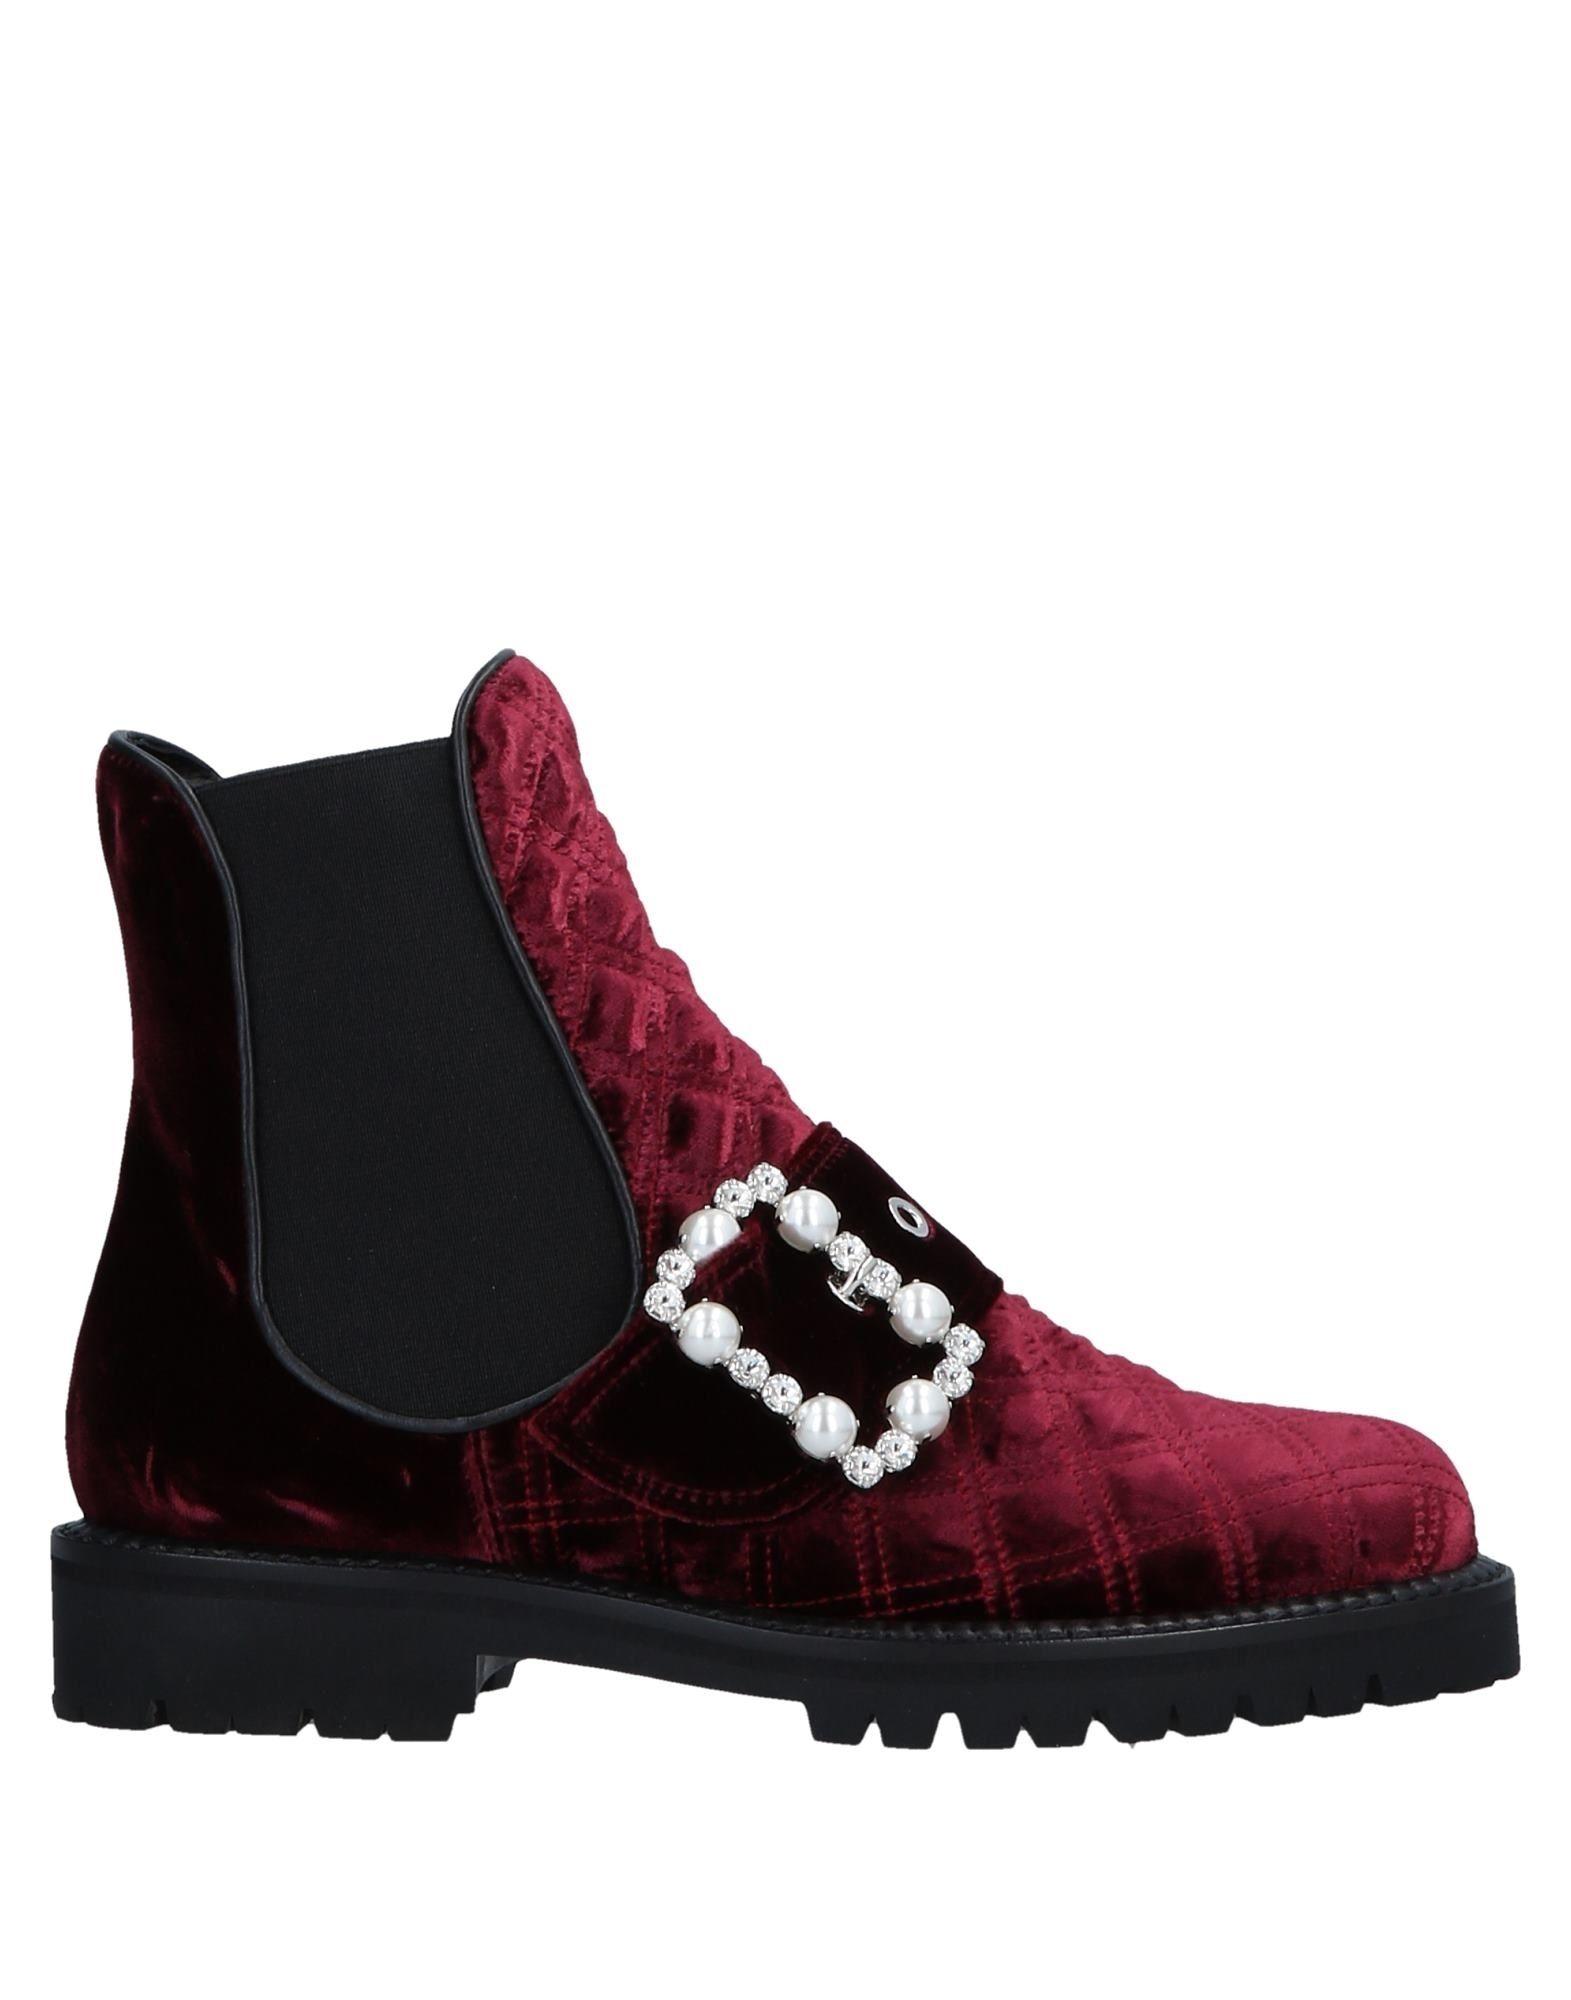 Bottine Sebastian Femme - Bottines Sebastian Pourpre Chaussures casual sauvages